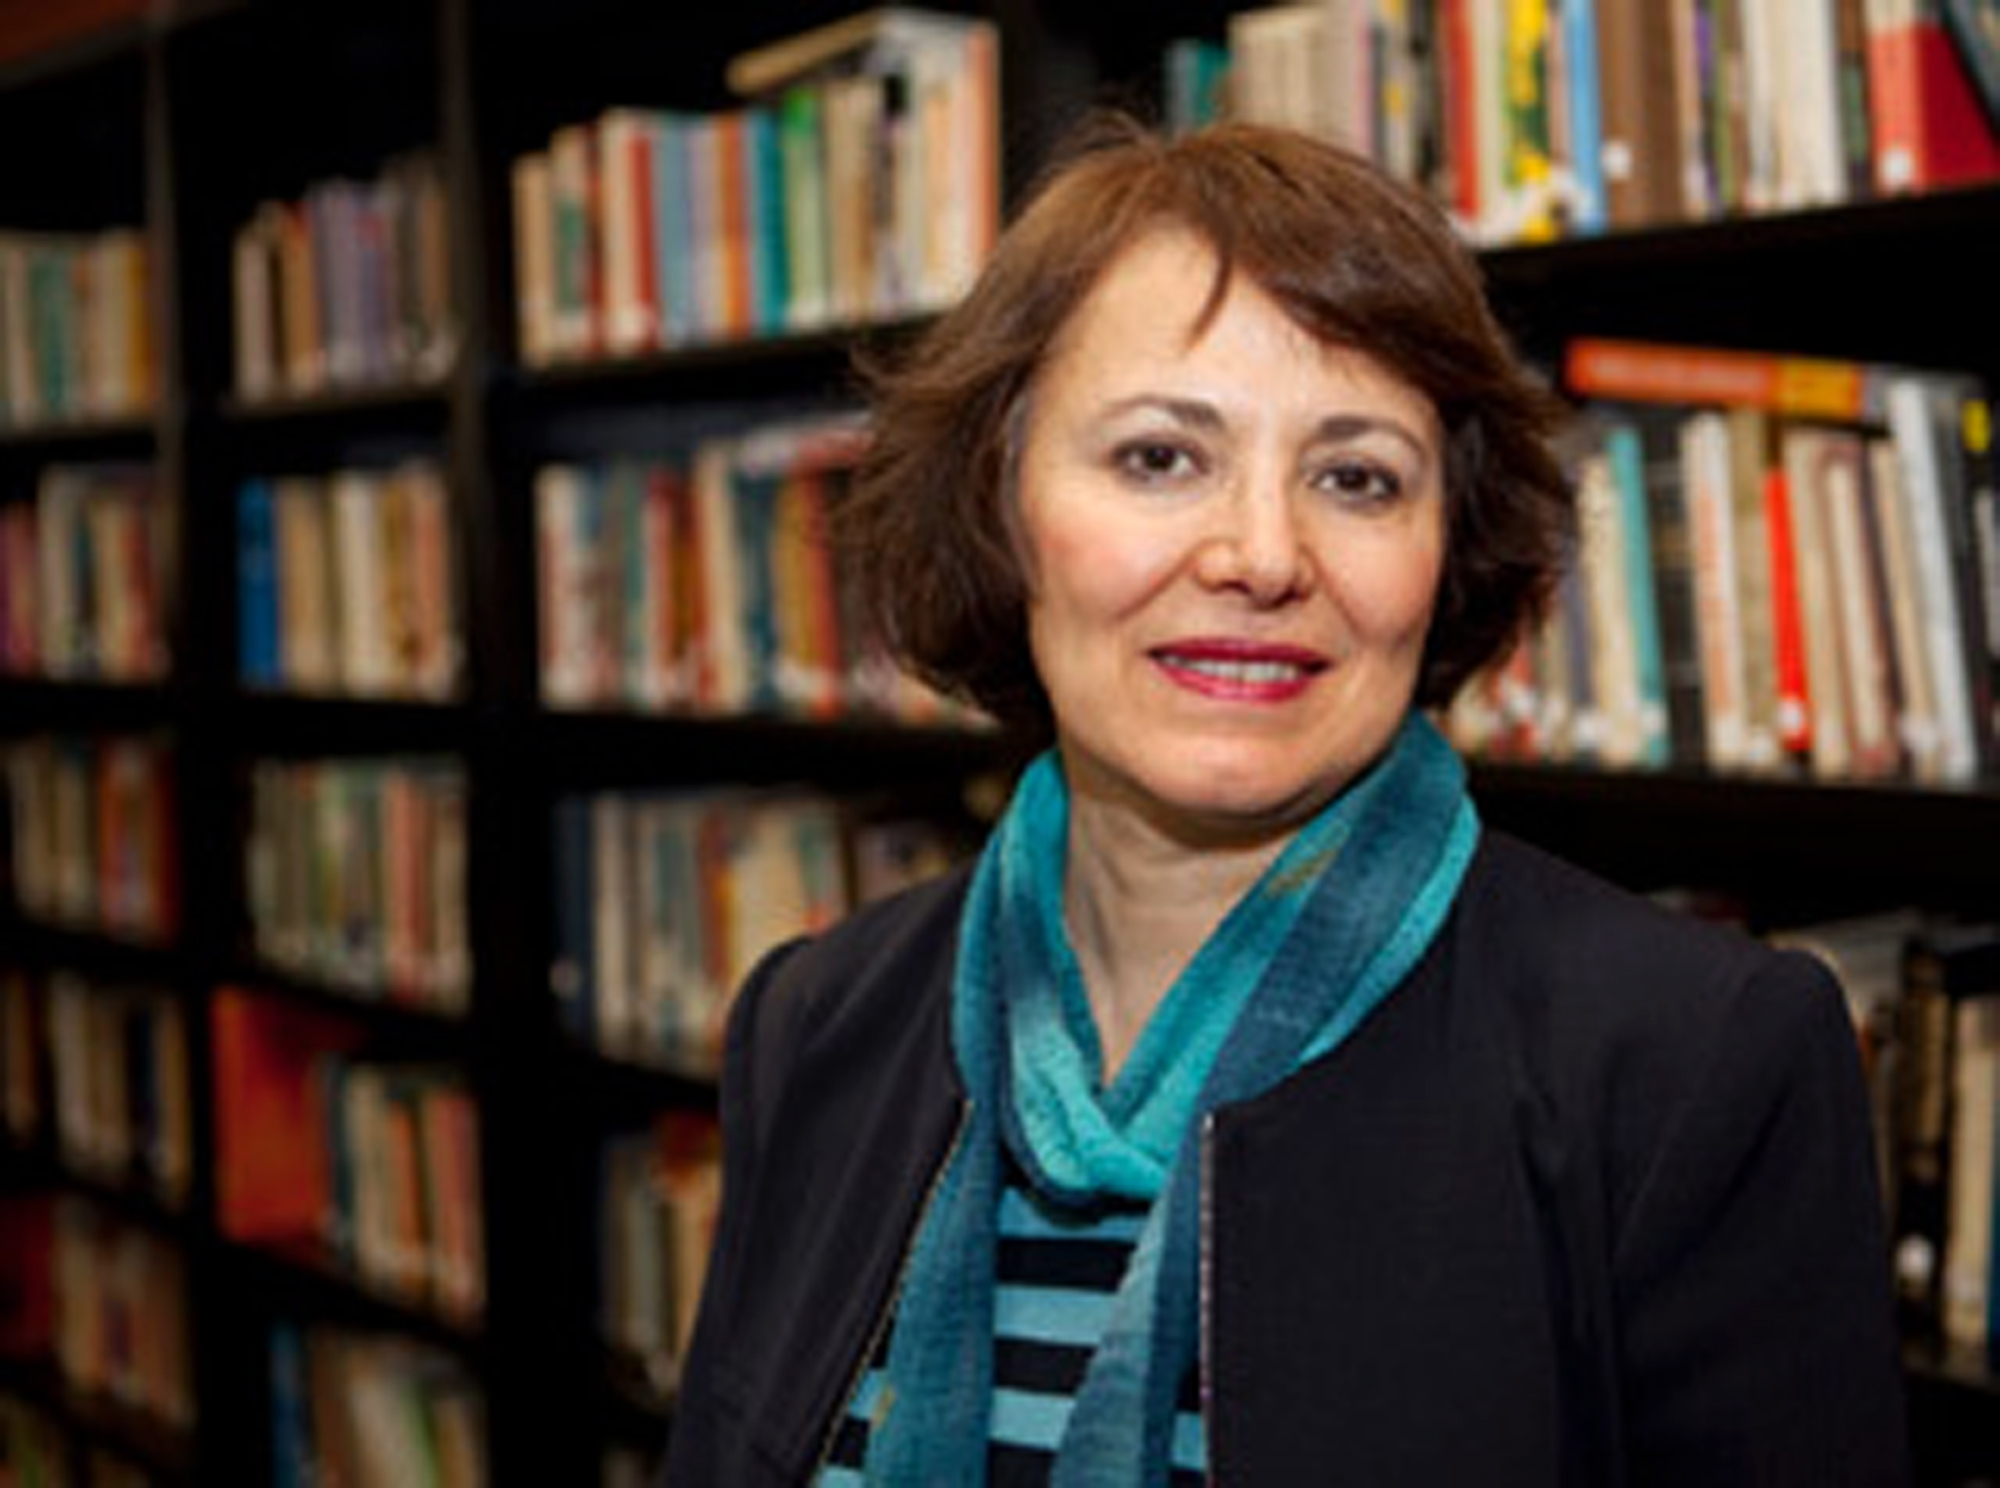 Retired Iranian-Canadian professor Homa Hoodfar in an undated photo.